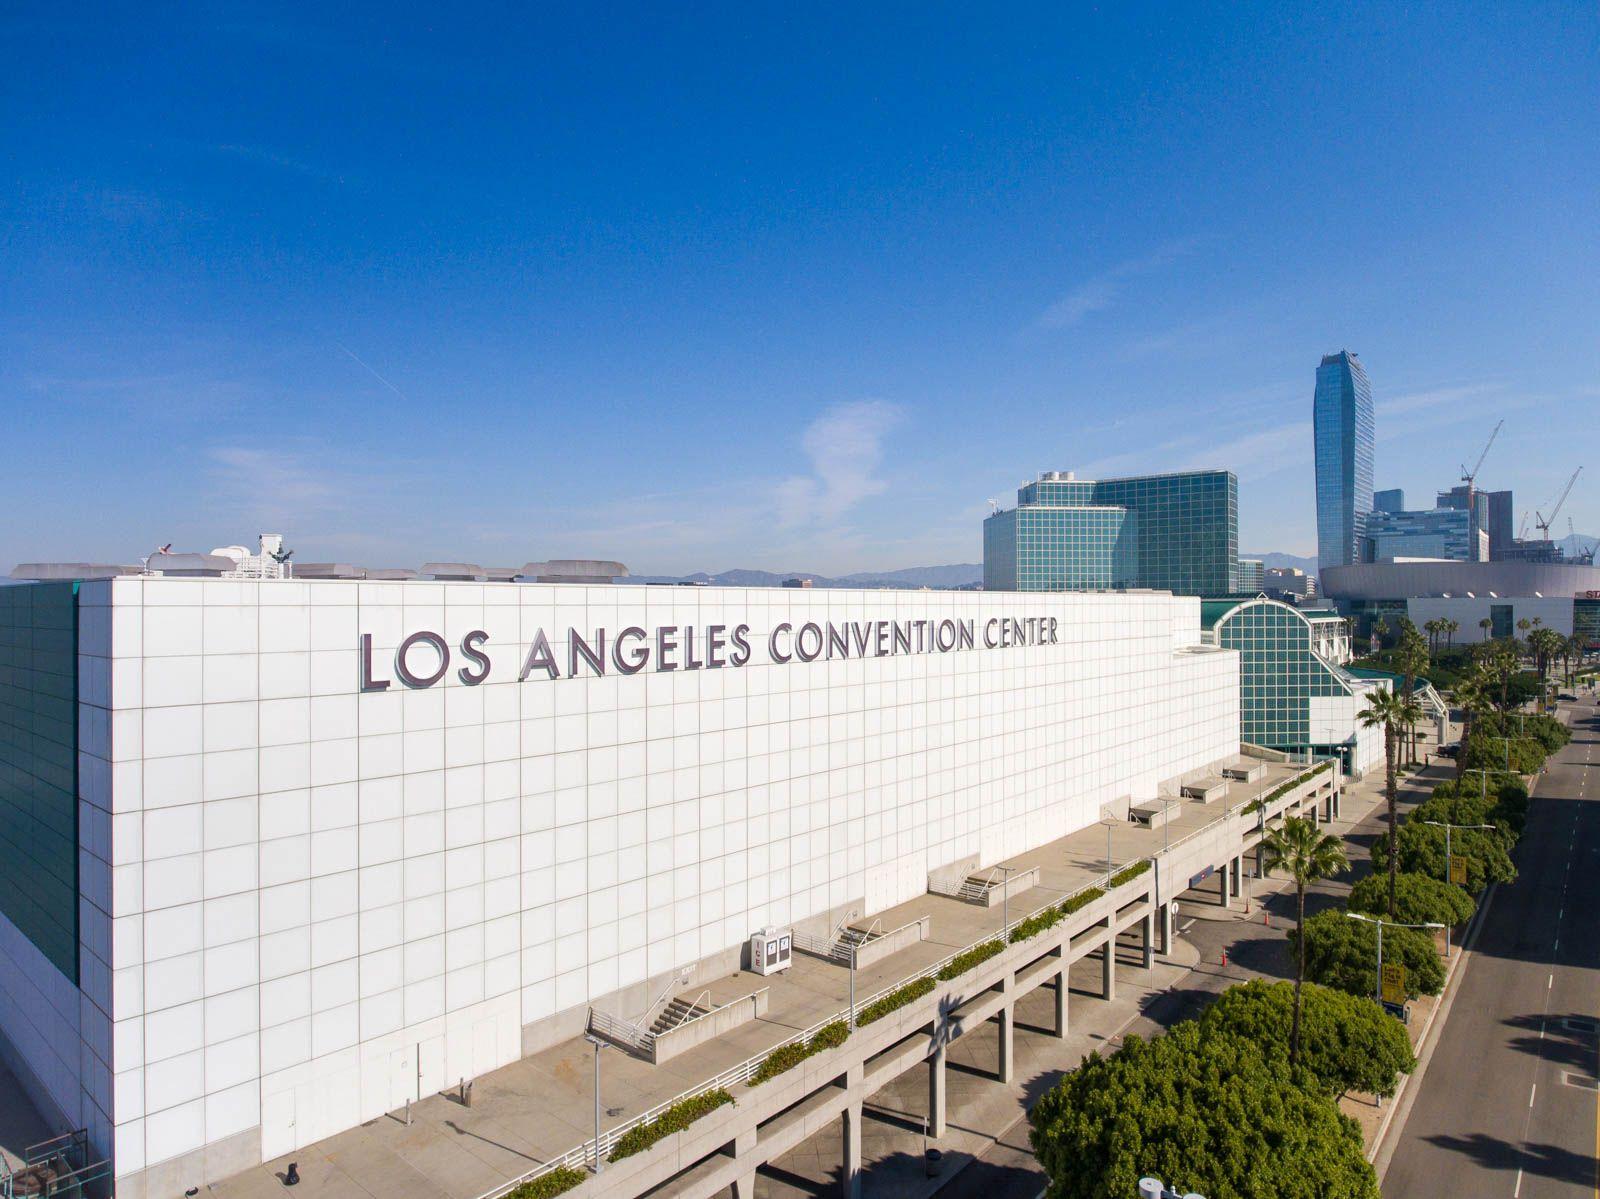 Los Angeles Convention Centre